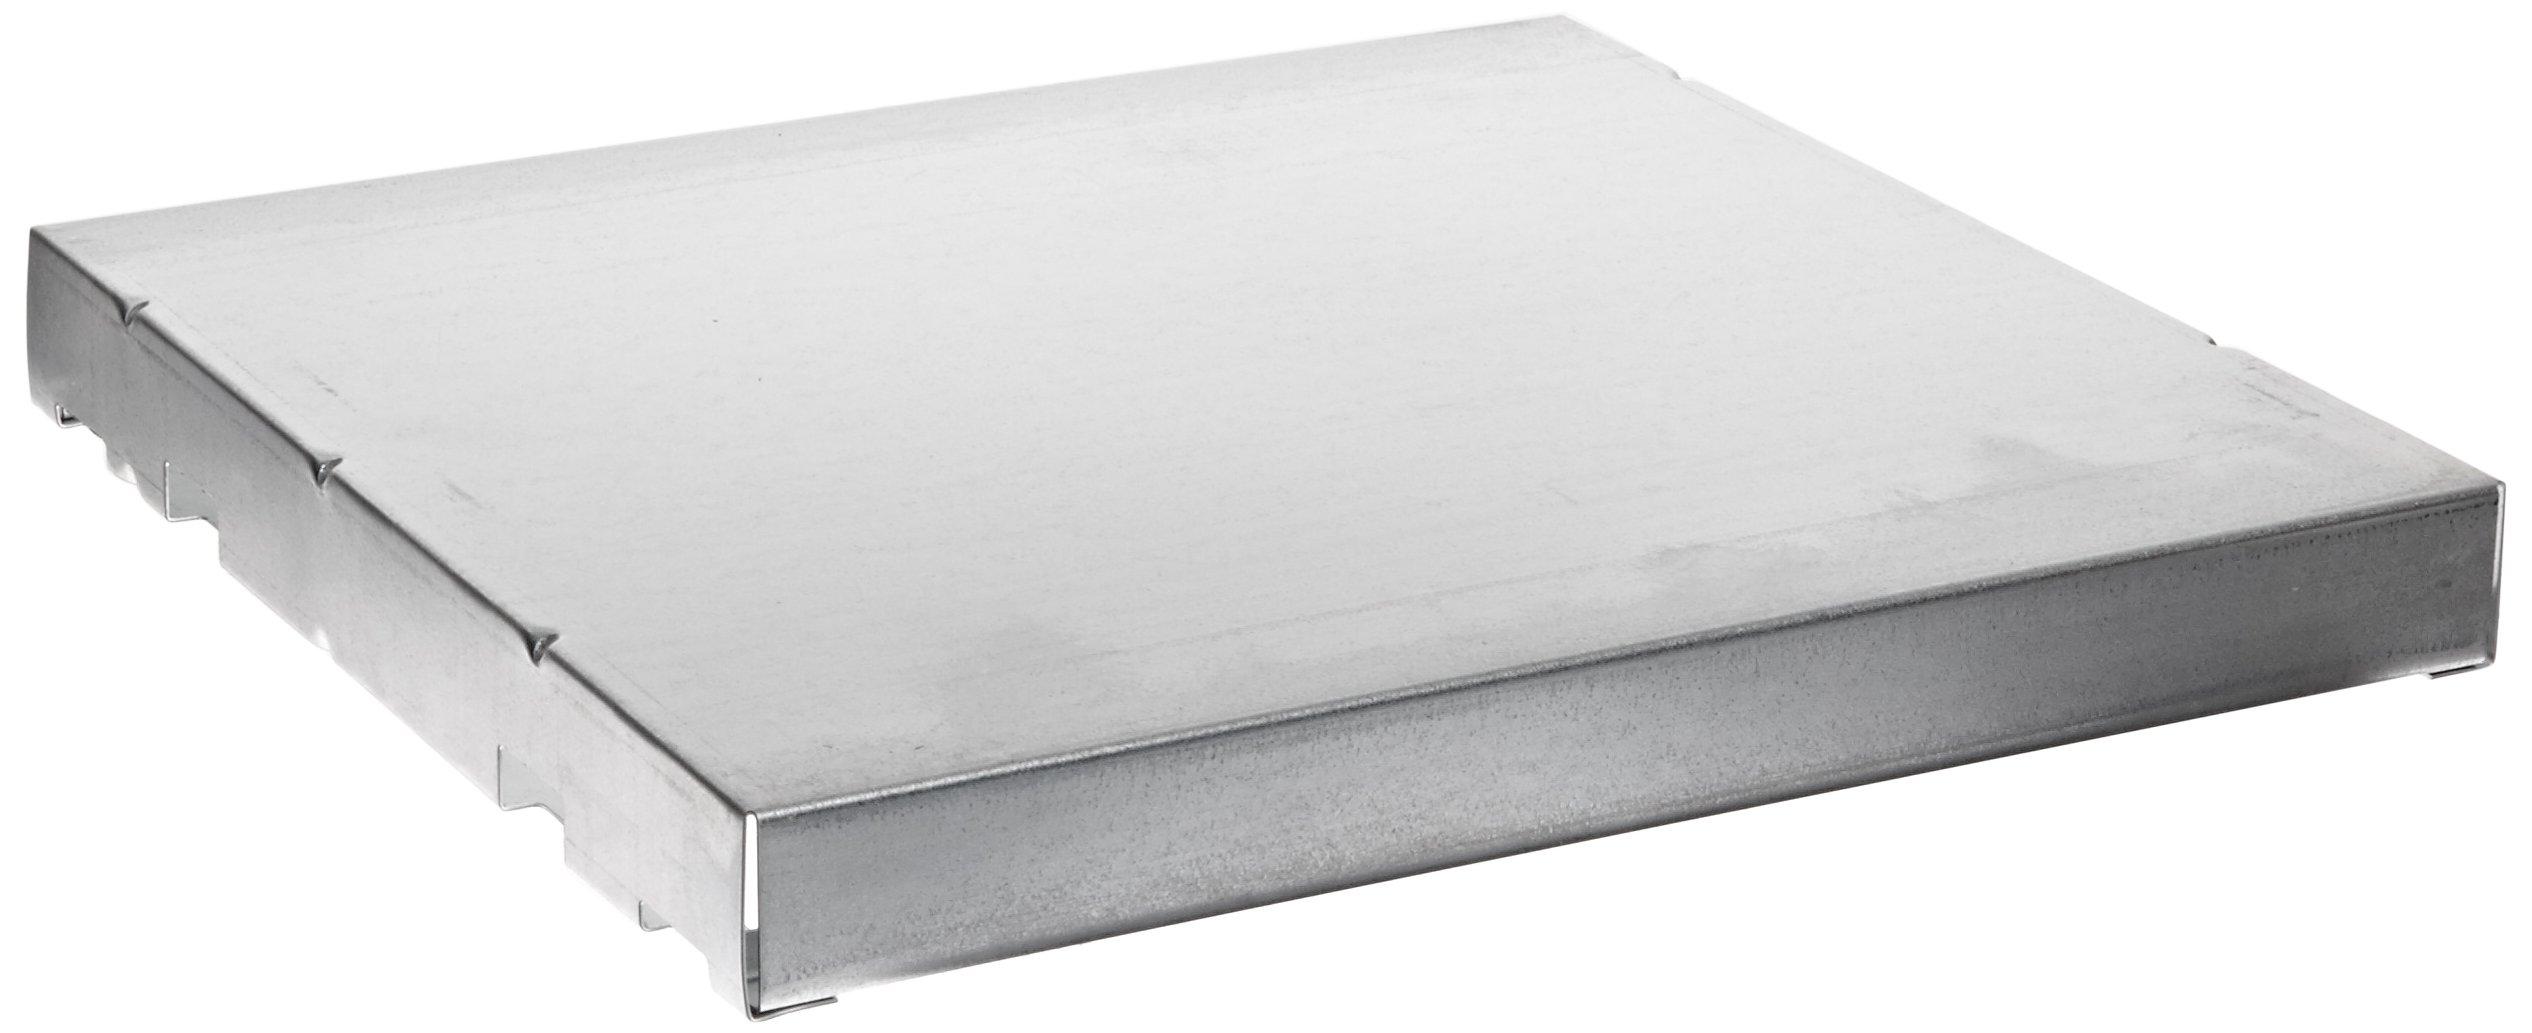 Justrite 29935 SpillSlope Galvanized Steel Shelf, 13-3/8'' Width x 13'' Depth, For 4 Gallon Safety Cabinet